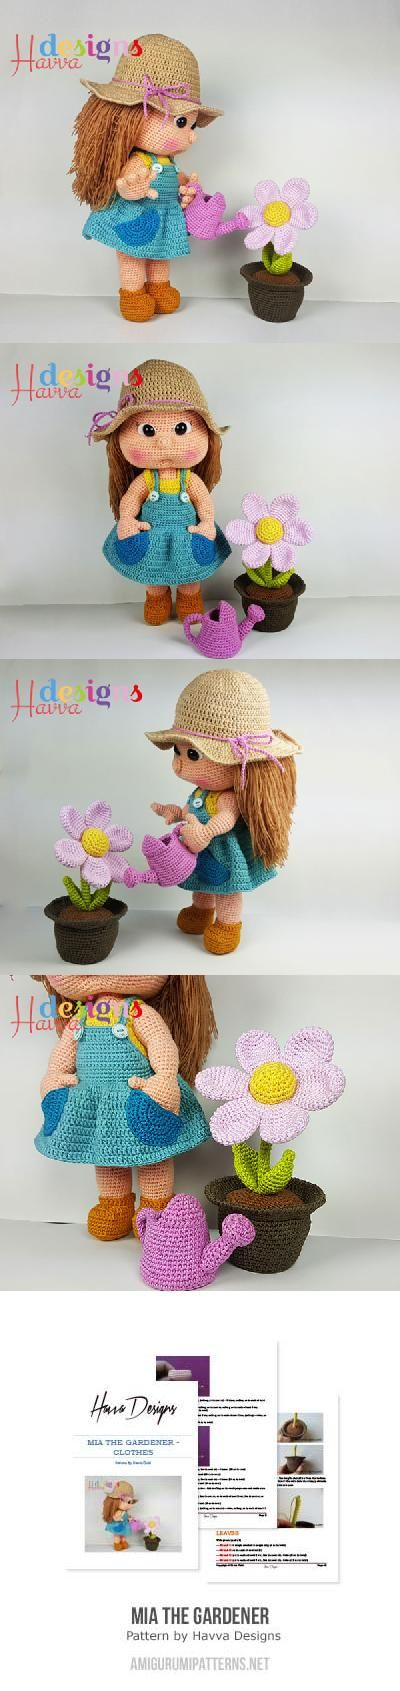 Mia The Gardener Amigurumi Pattern Crochet Knitting Weaving